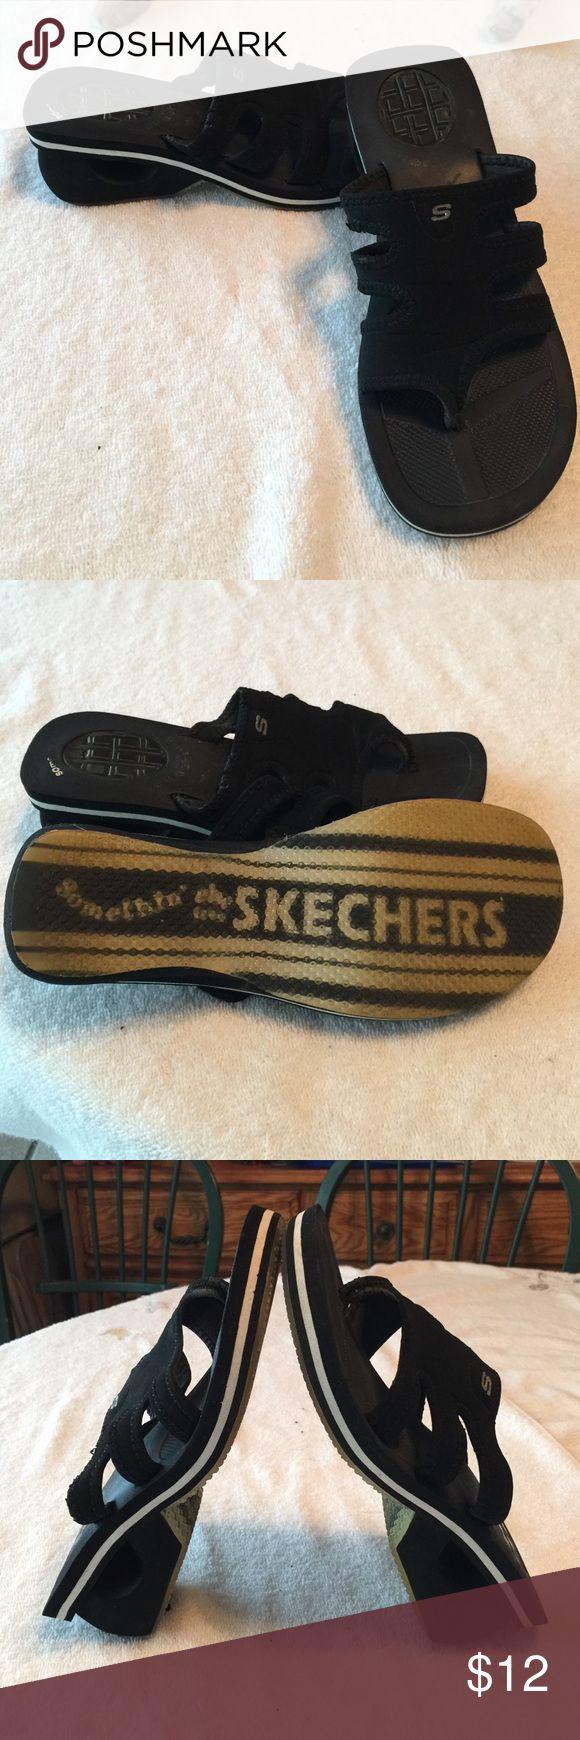 "Skecher Sandals Skecher sandals, black, size 8 with 2-1/4"" heel, good used condition. Skechers Shoes Sandals"